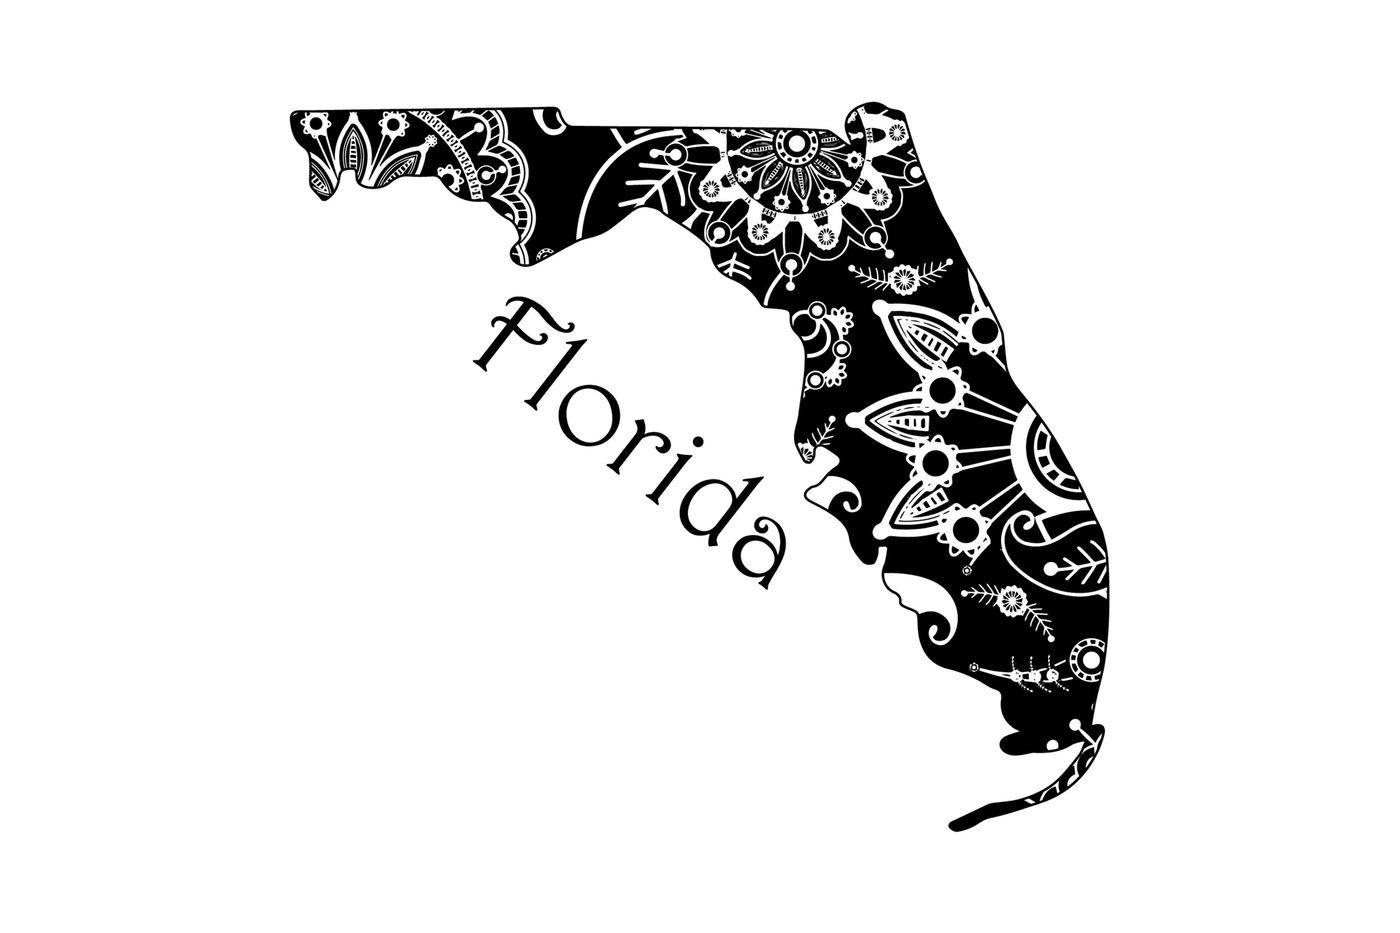 Mandala Florida Svg Dxf Eps Png Ai By Twelvepapers Thehungryjpeg Com